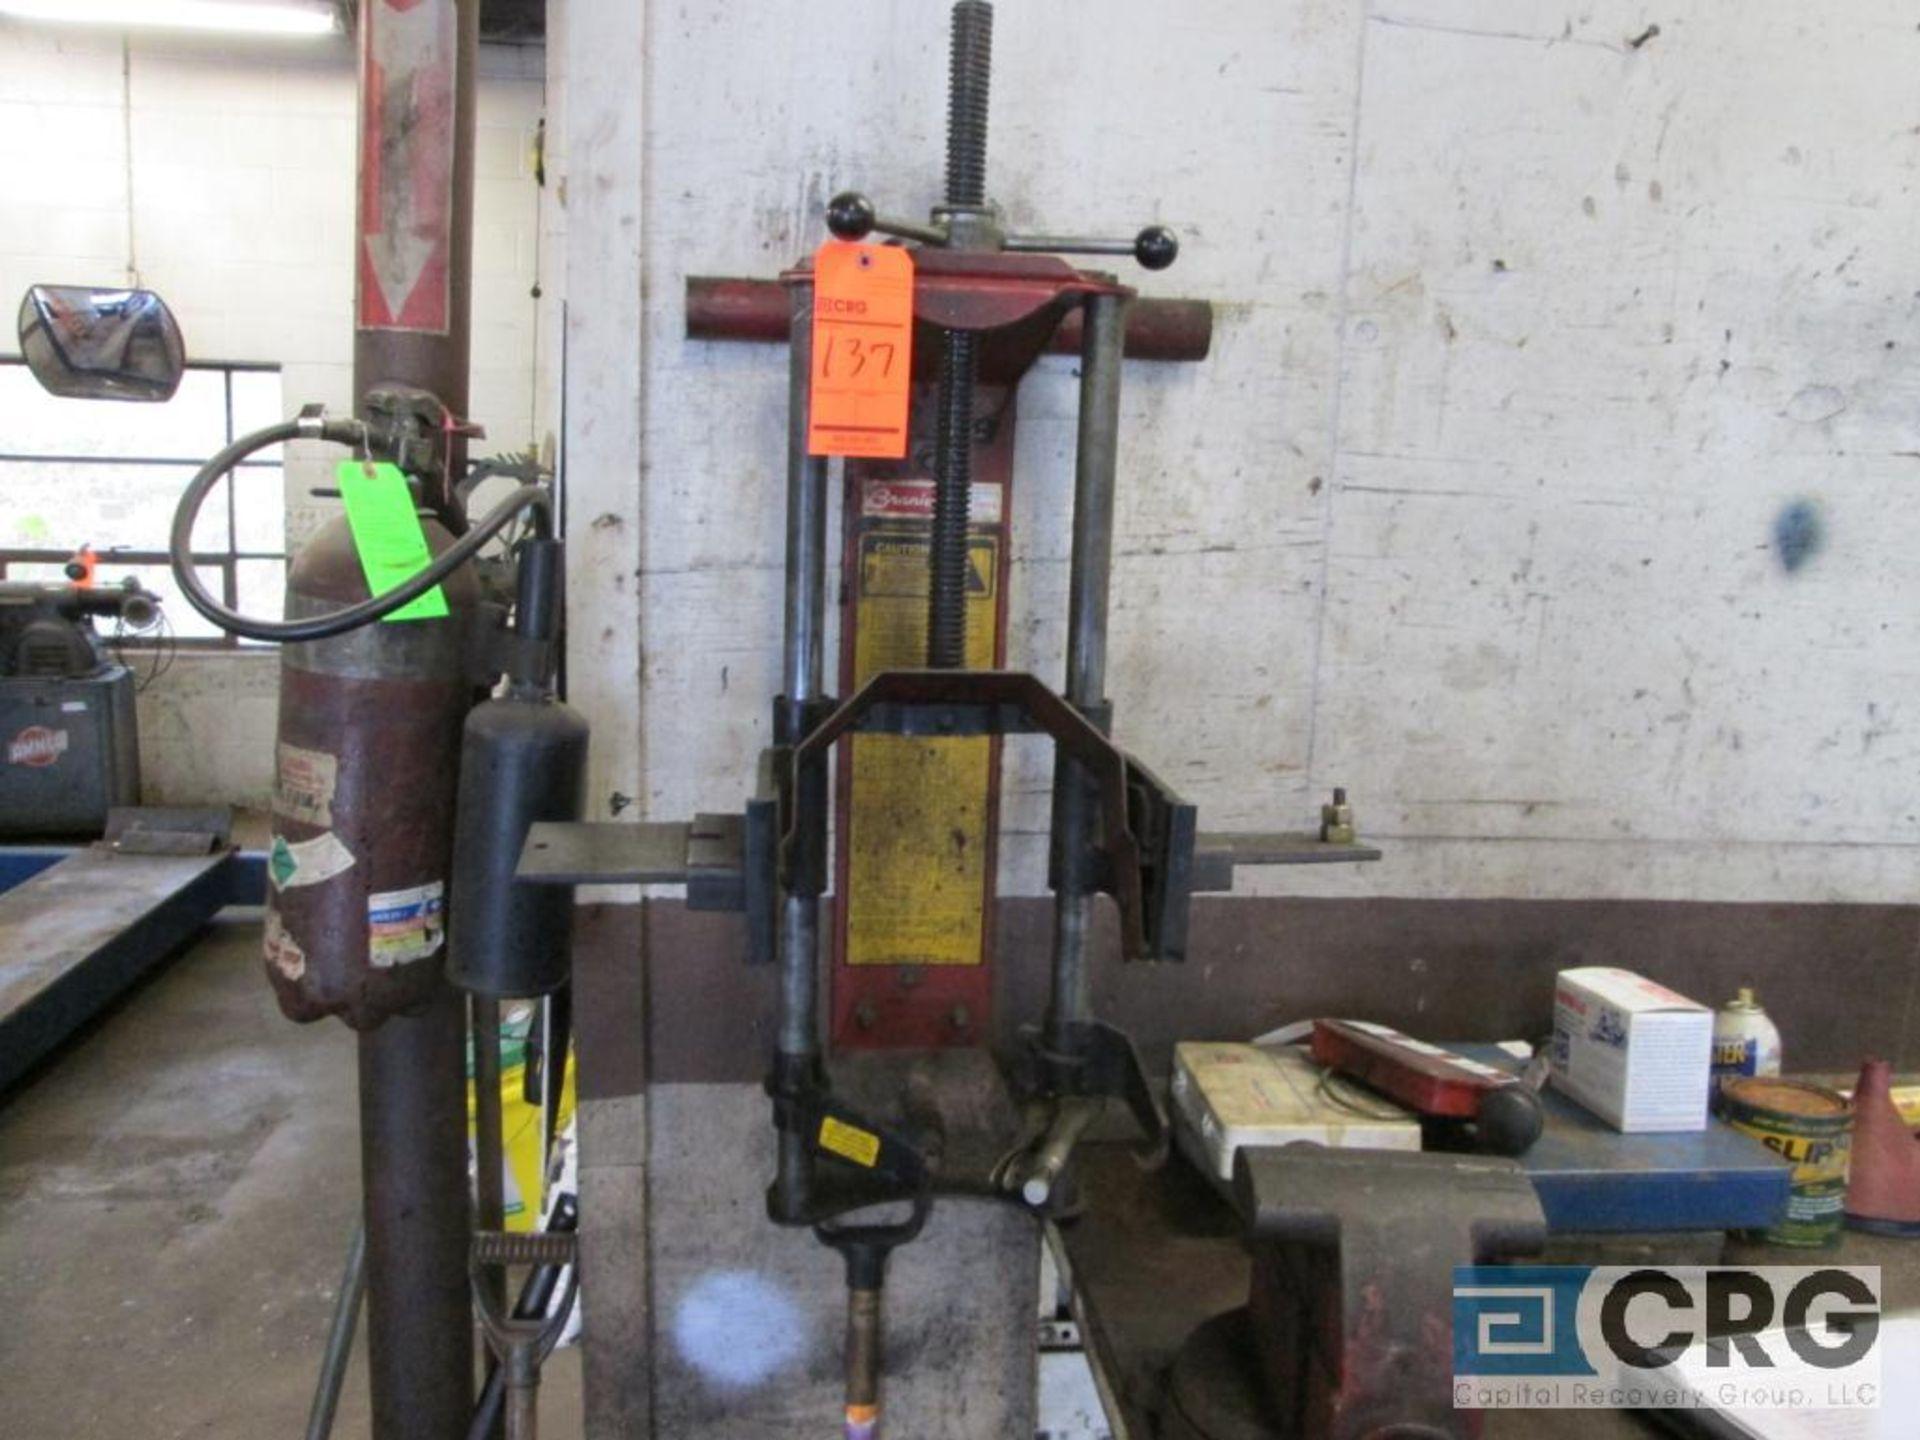 Branick MST-580A strut spring compressor wall mounted